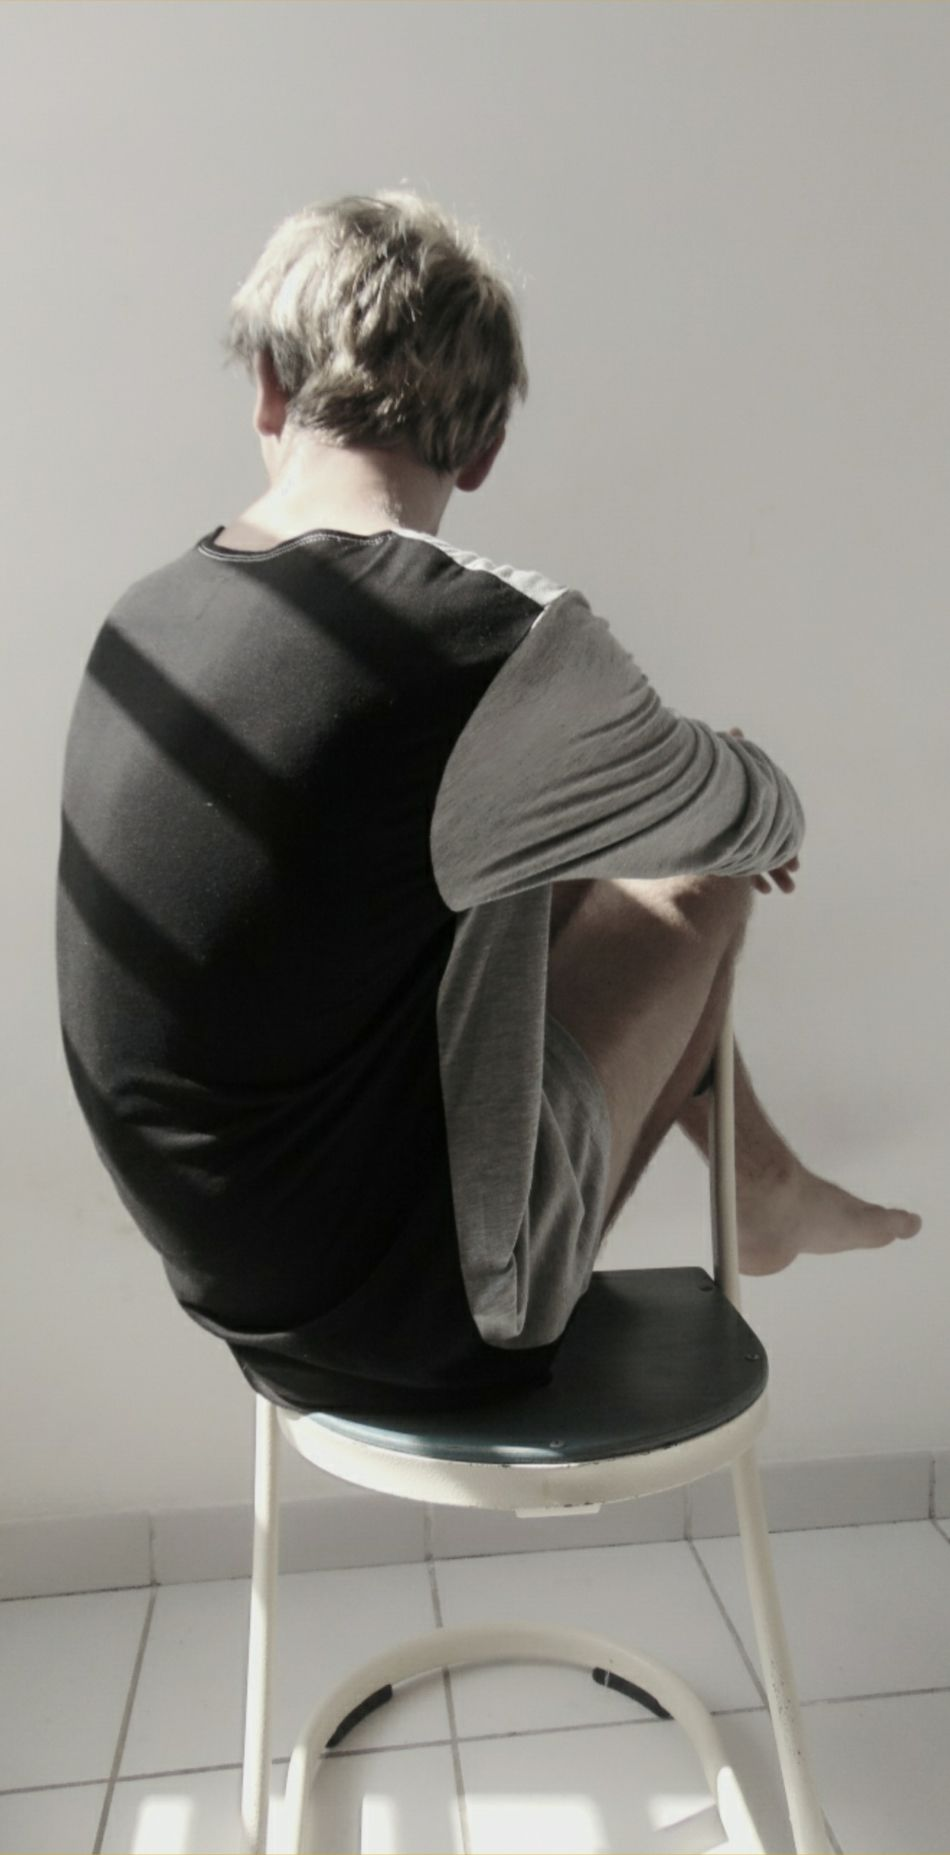 Art Model Chair Monochrome Dre▲m Popular Photos